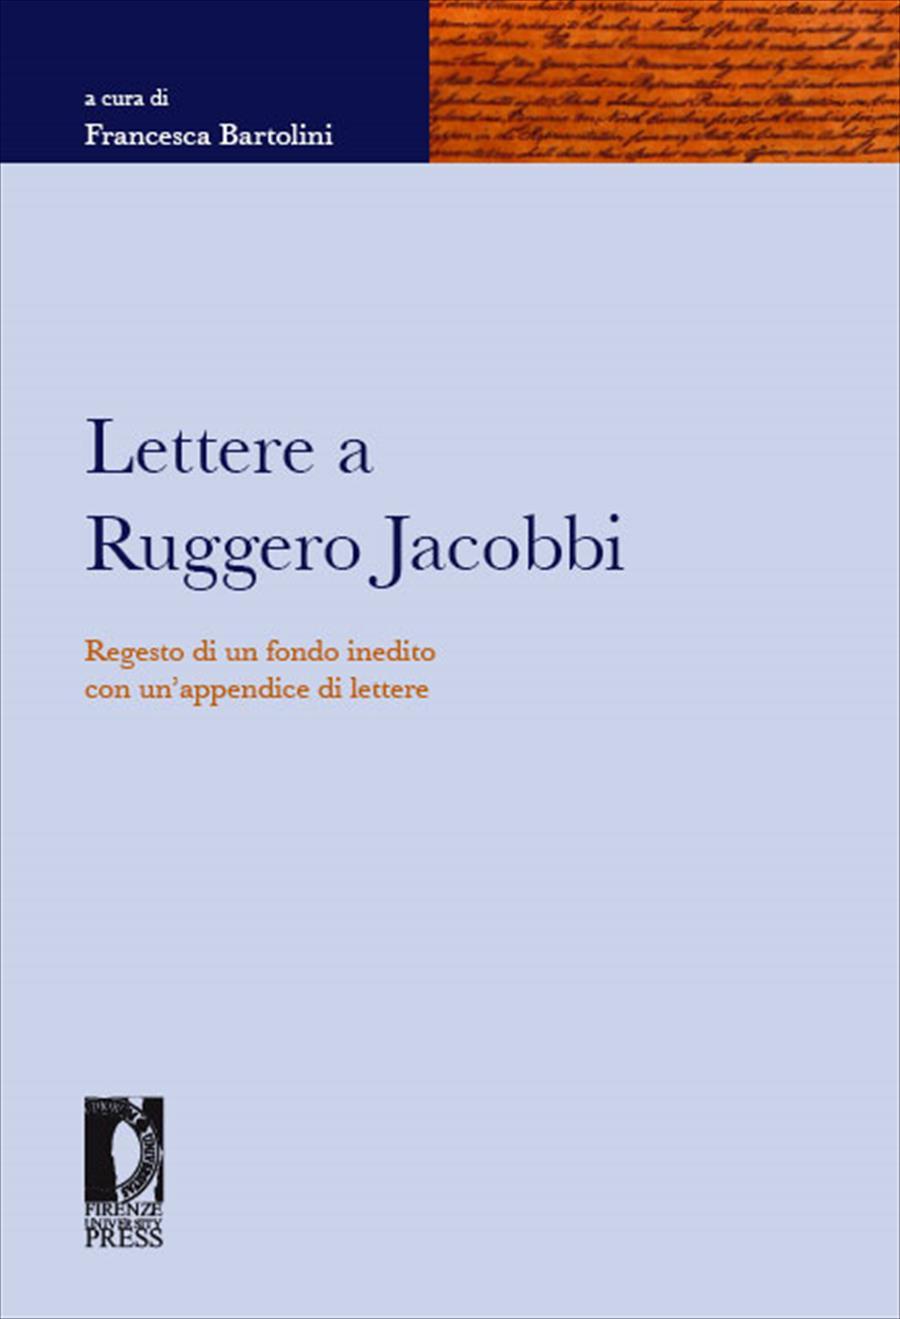 Lettere a Ruggero Jacobbi